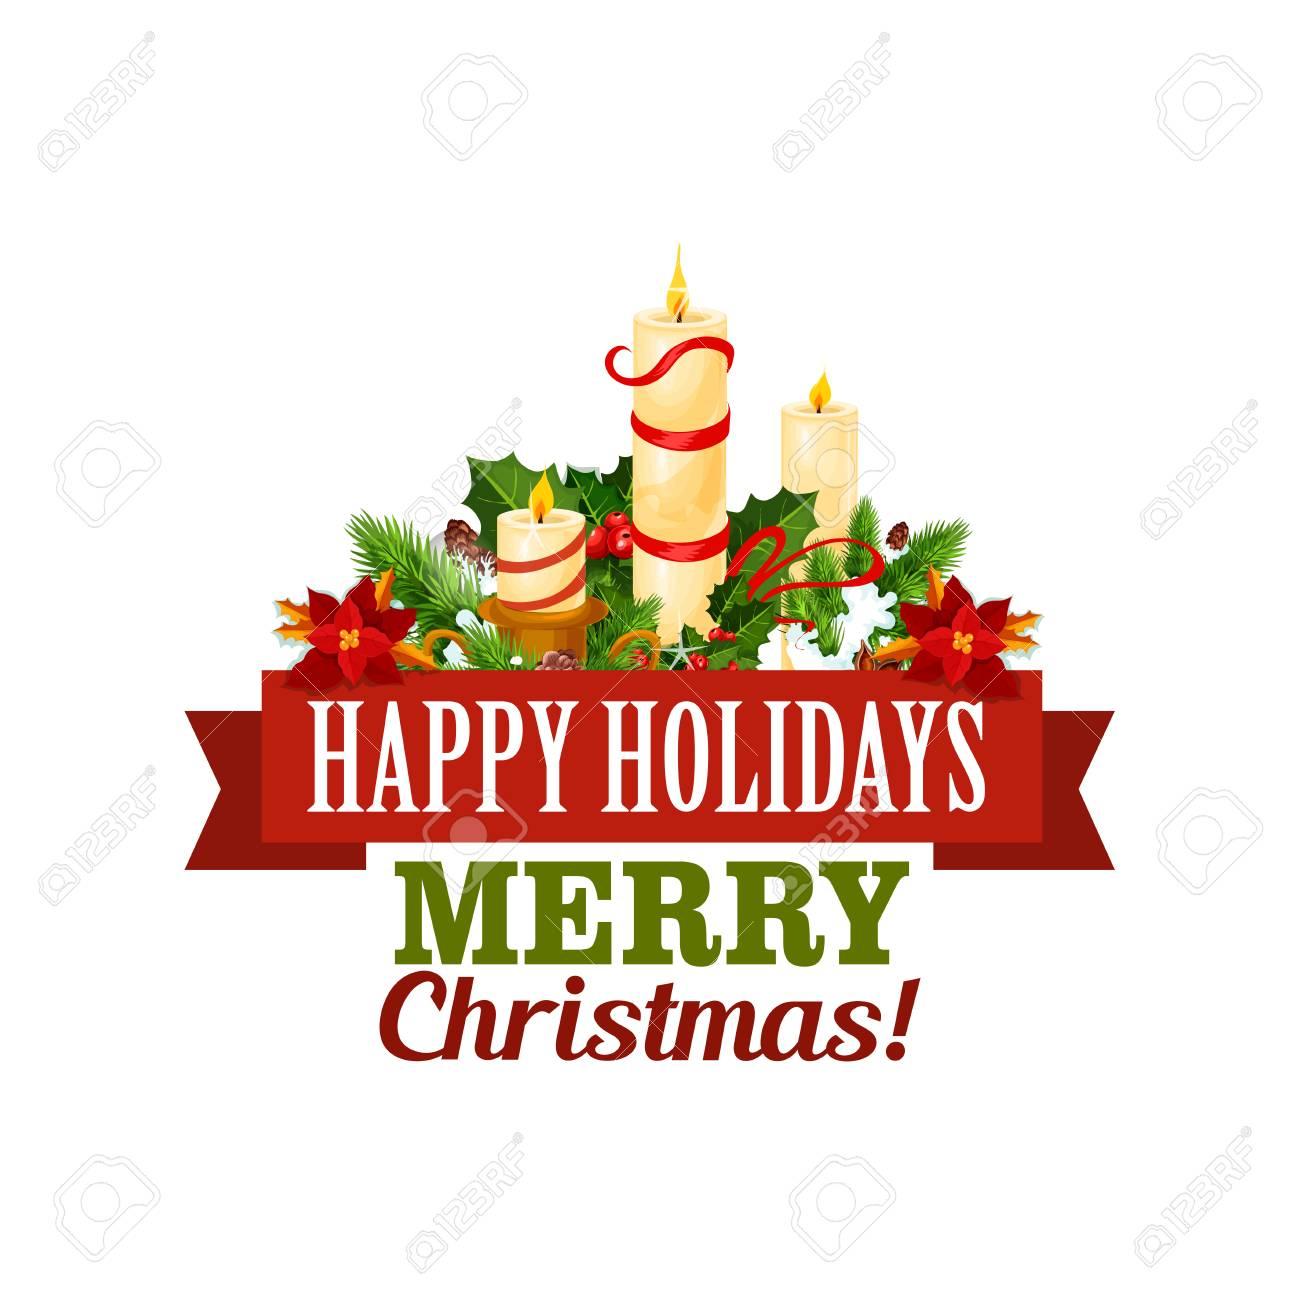 Christmas Holidays Icon.Merry Christmas Holiday Vector Greeting Card Icon